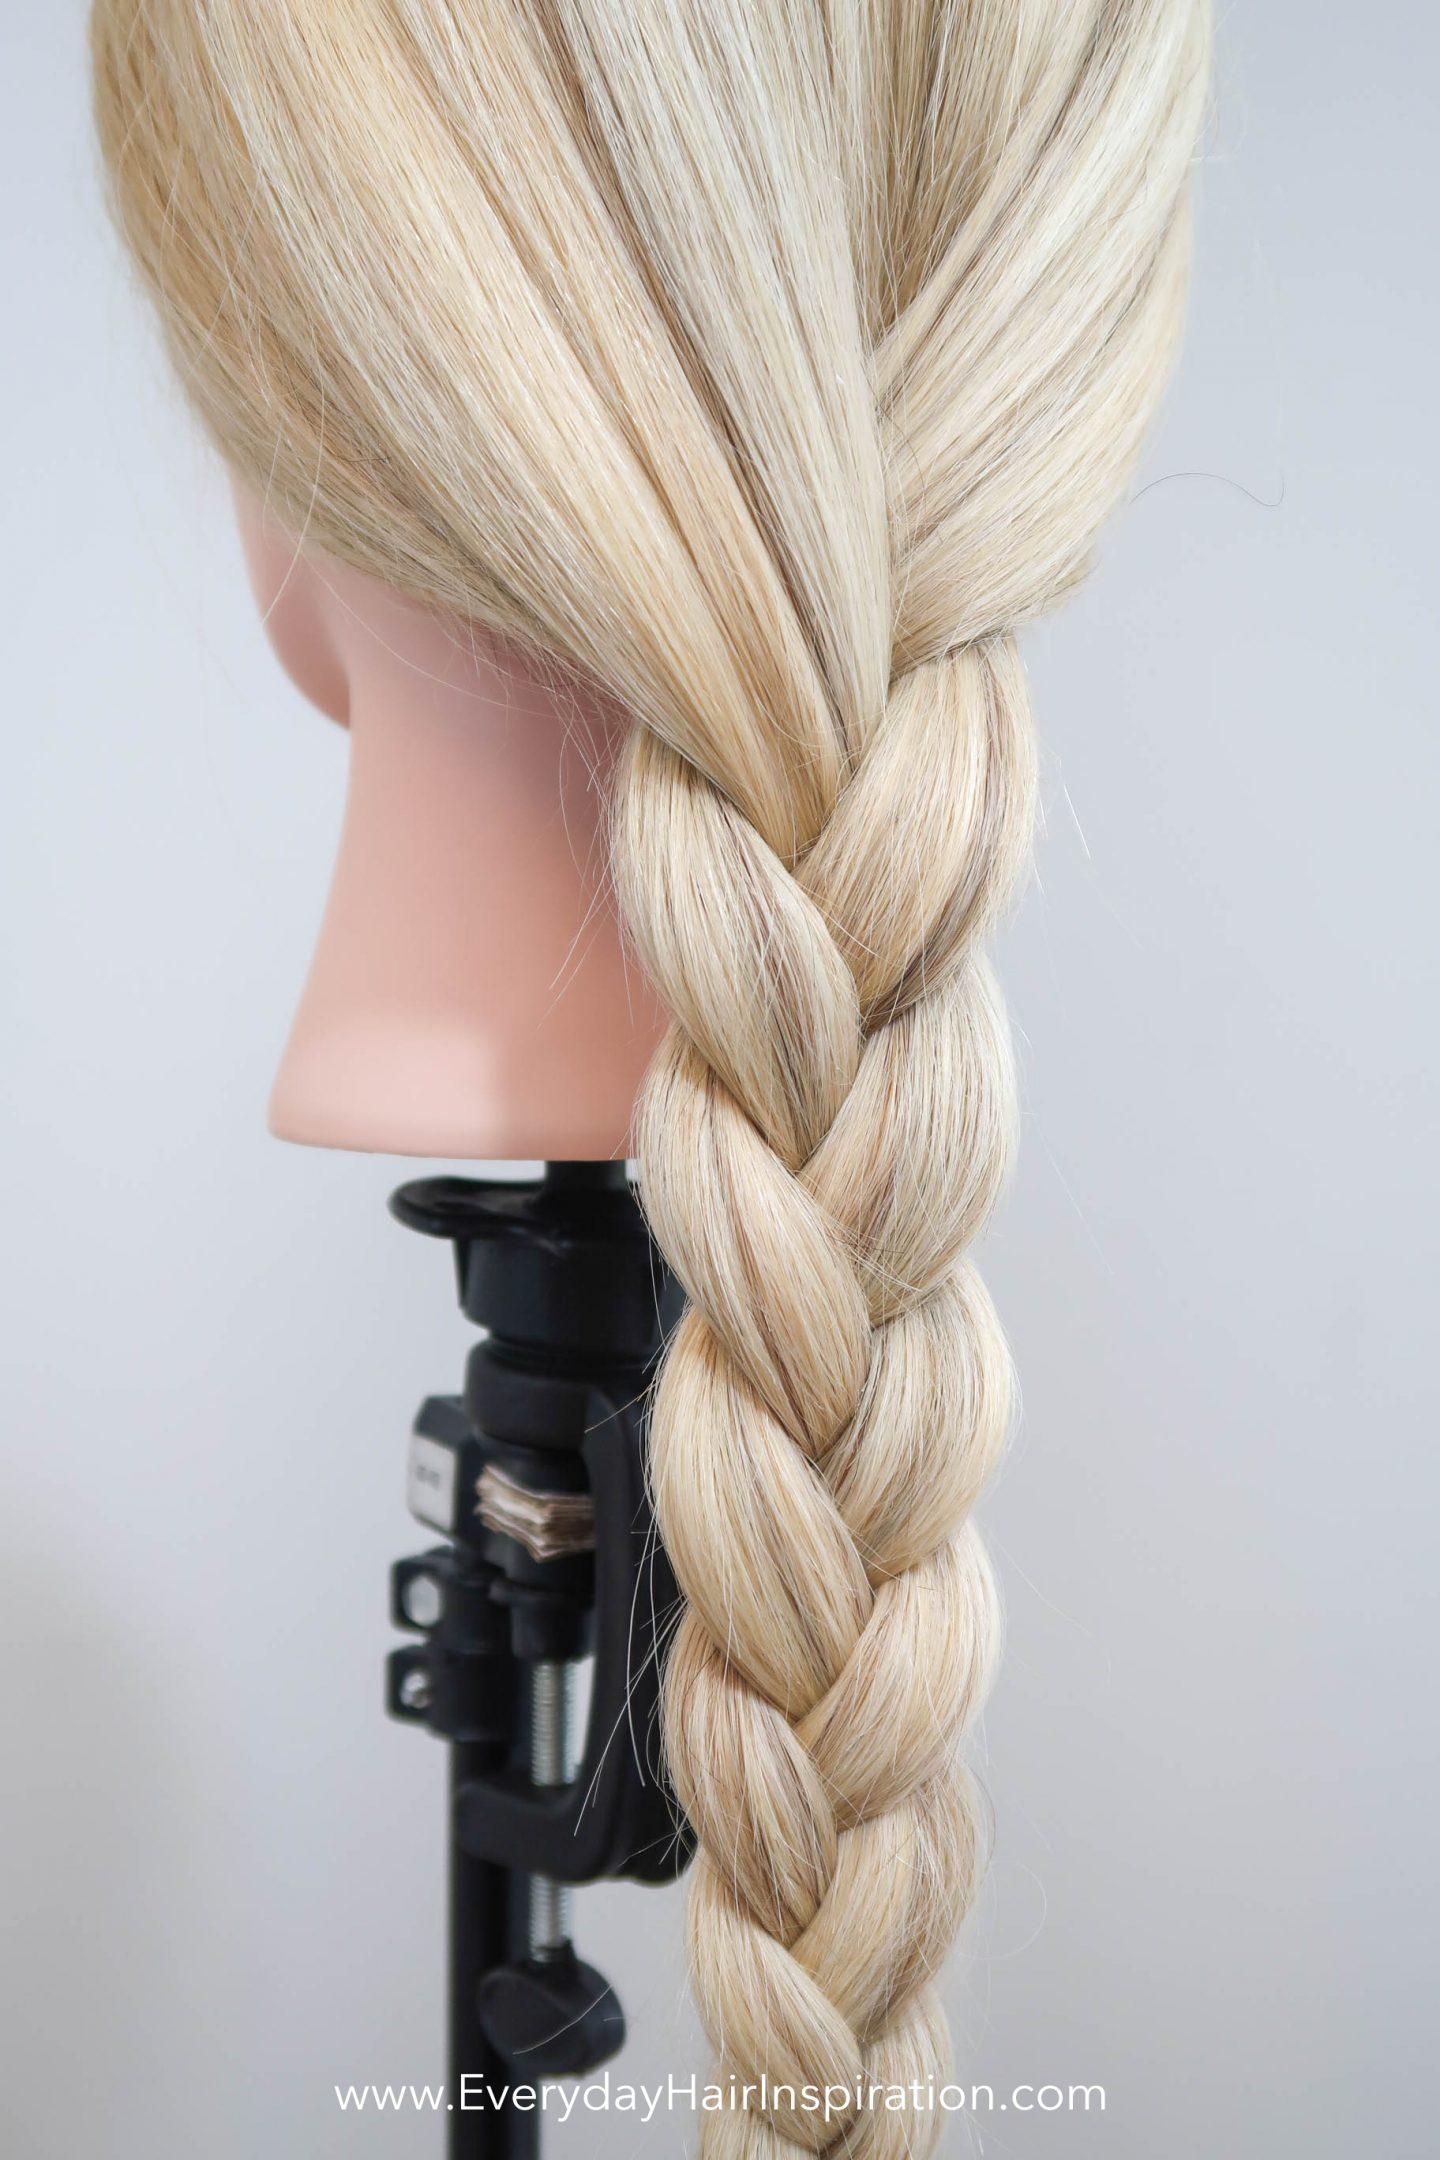 Basic 3 Strand Braid Everyday Hair Inspiration Braids